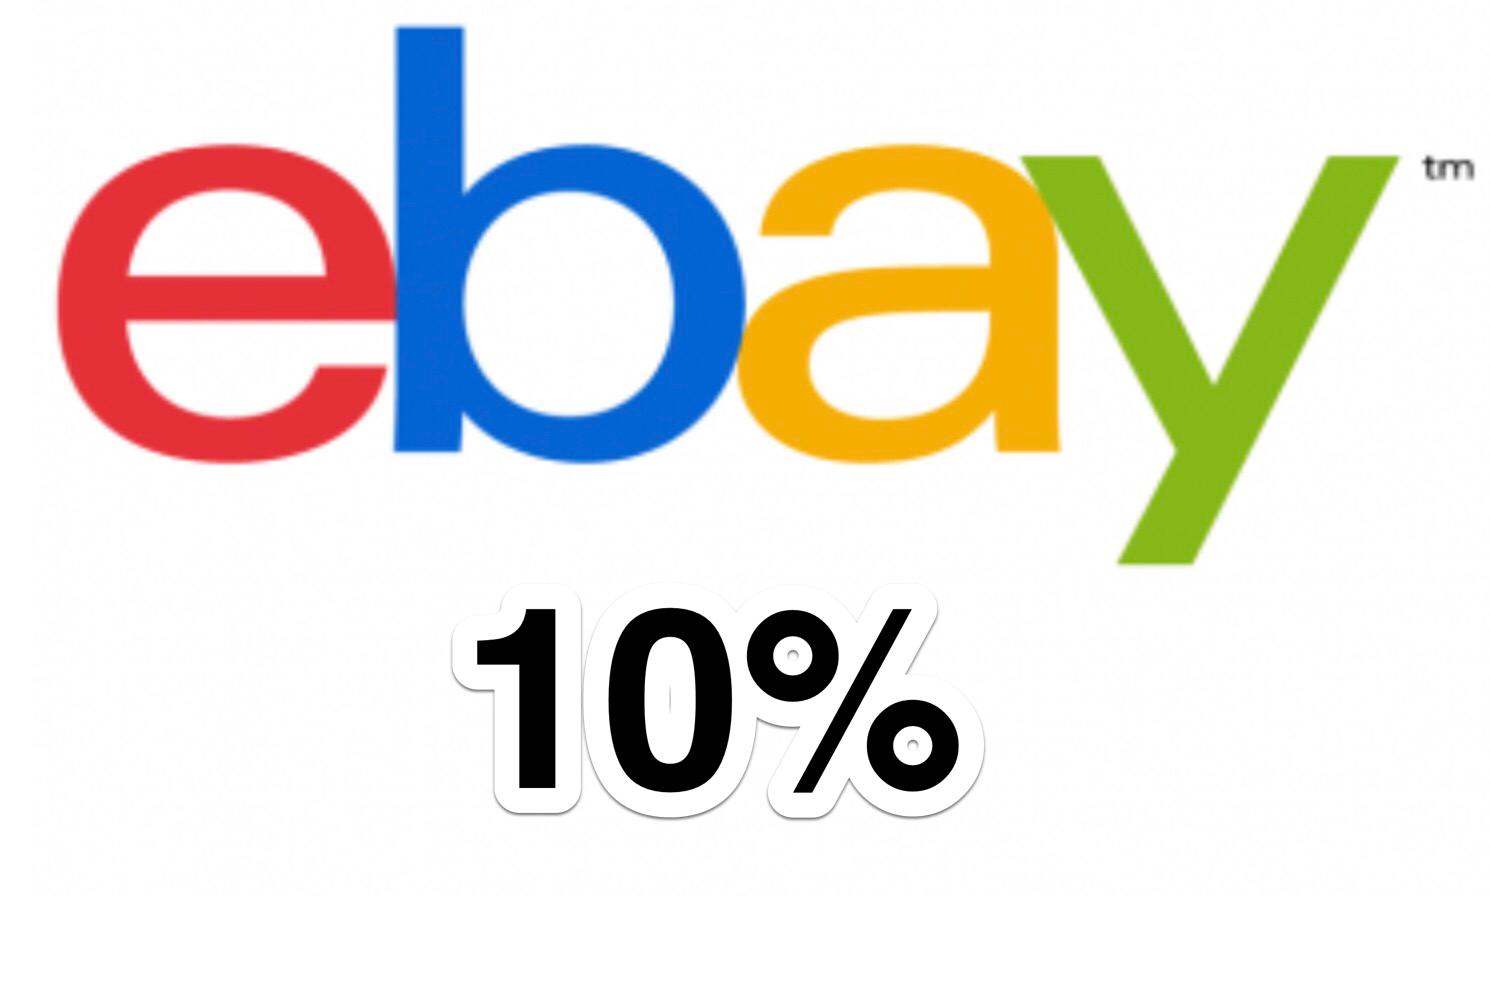 Ab 0.00 Uhr: Ebay Australien - 10% Rabatt auf fast alles max. 125€ Rabatt - z.B. Apple iPhone XS 64GB 827,99€ o. Nintendo Switch 266,81€